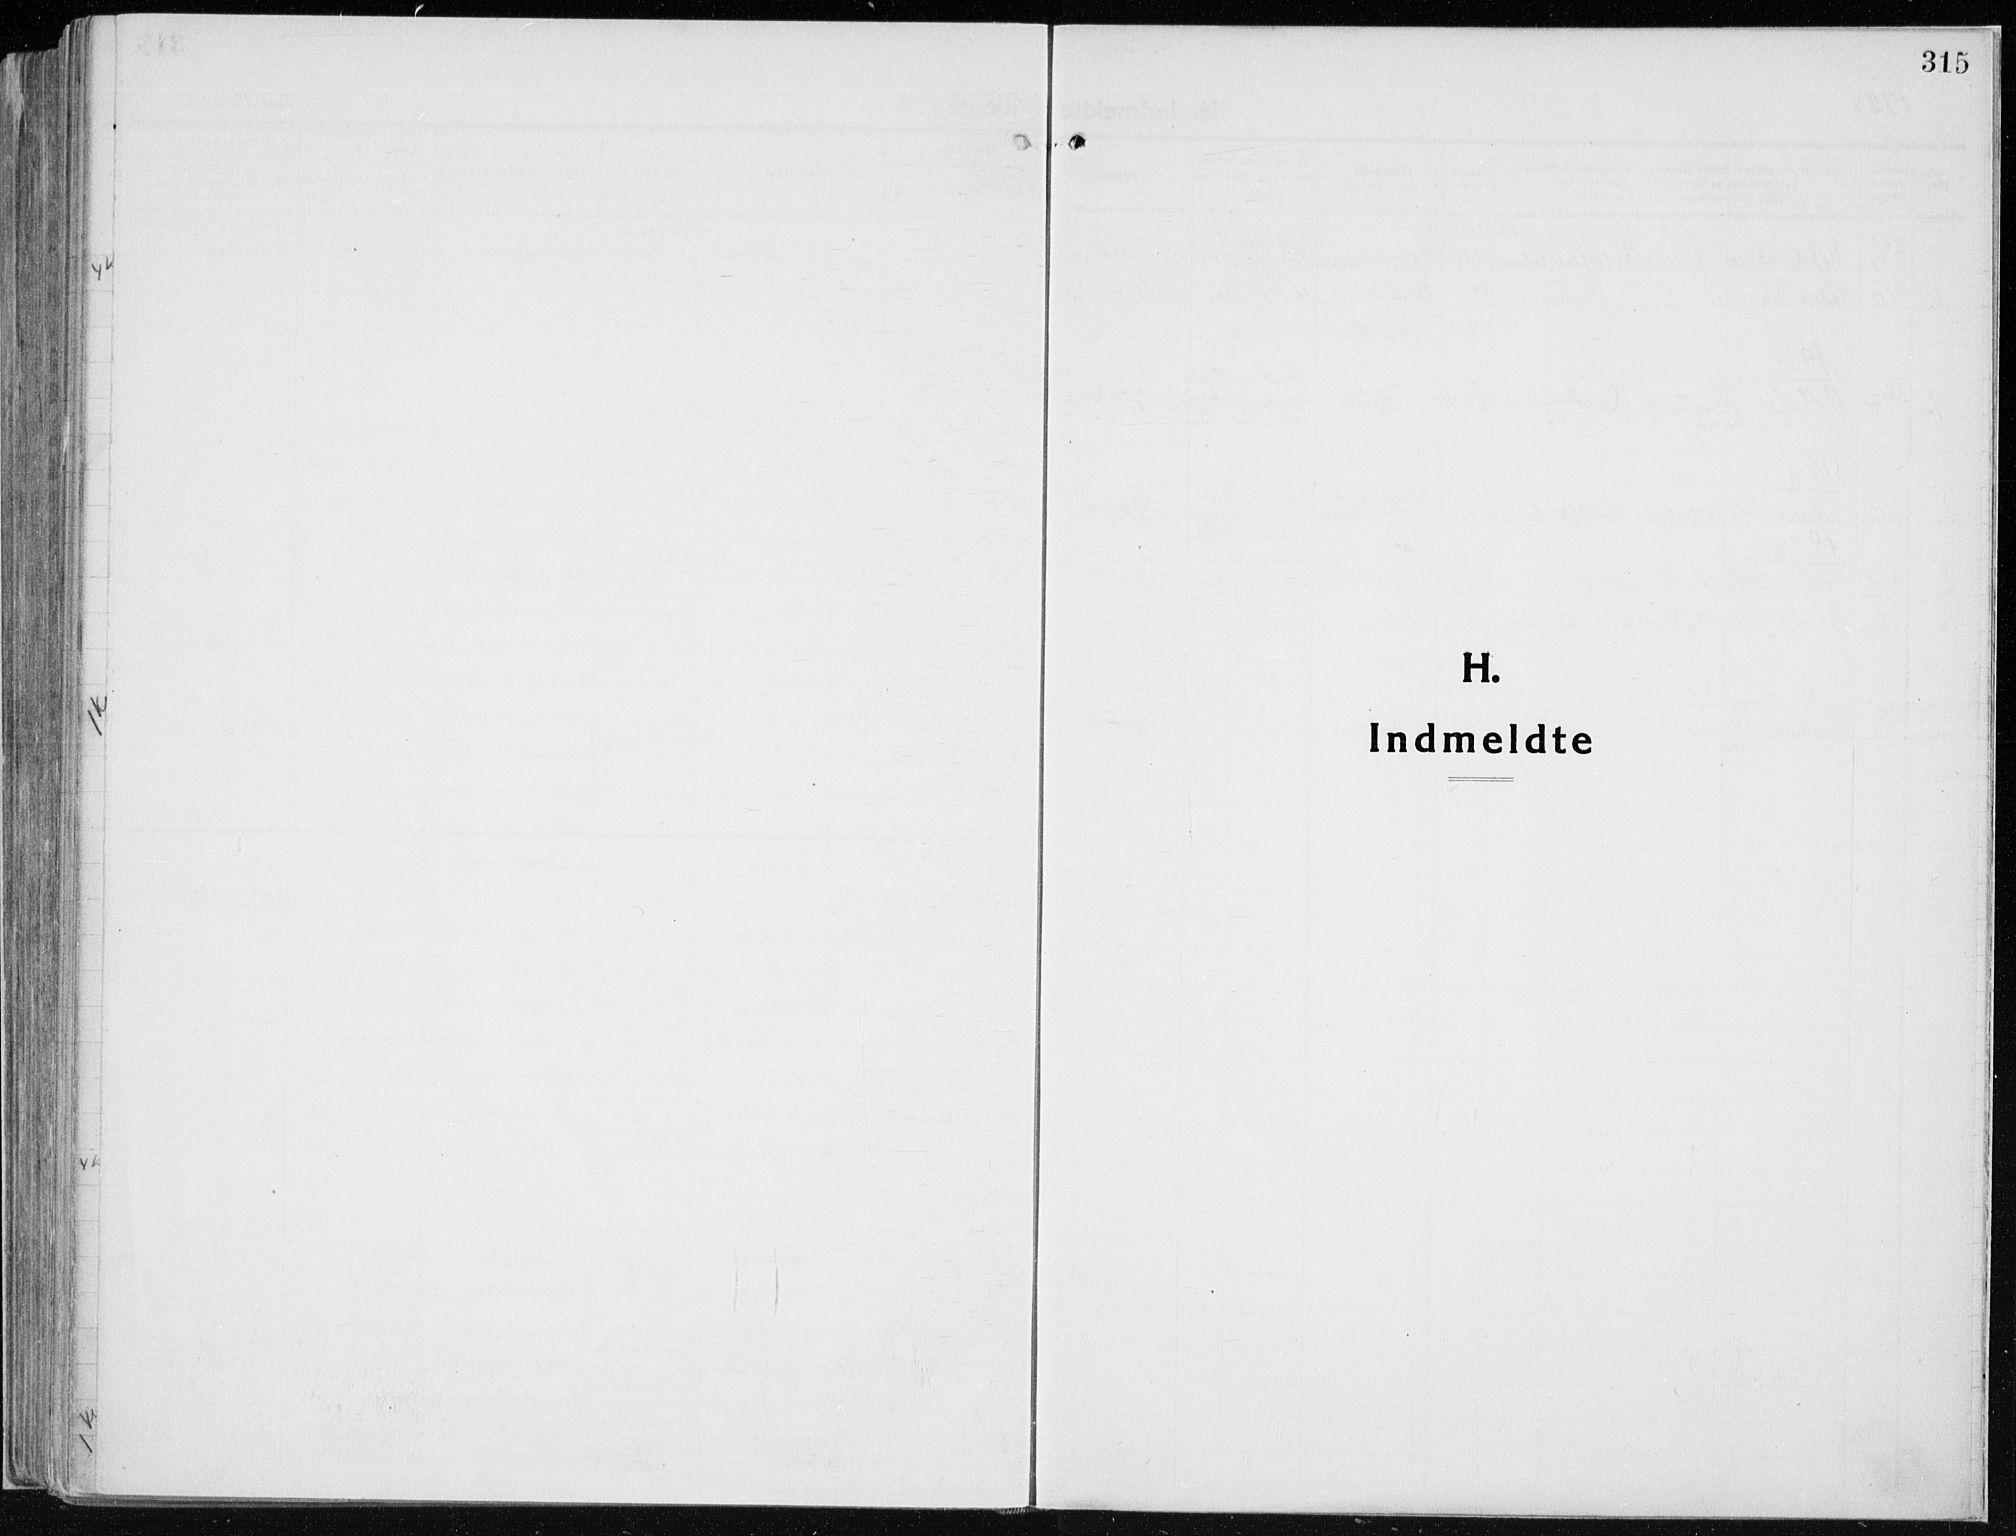 SAH, Vardal prestekontor, H/Ha/Haa/L0015: Ministerialbok nr. 15, 1923-1937, s. 315